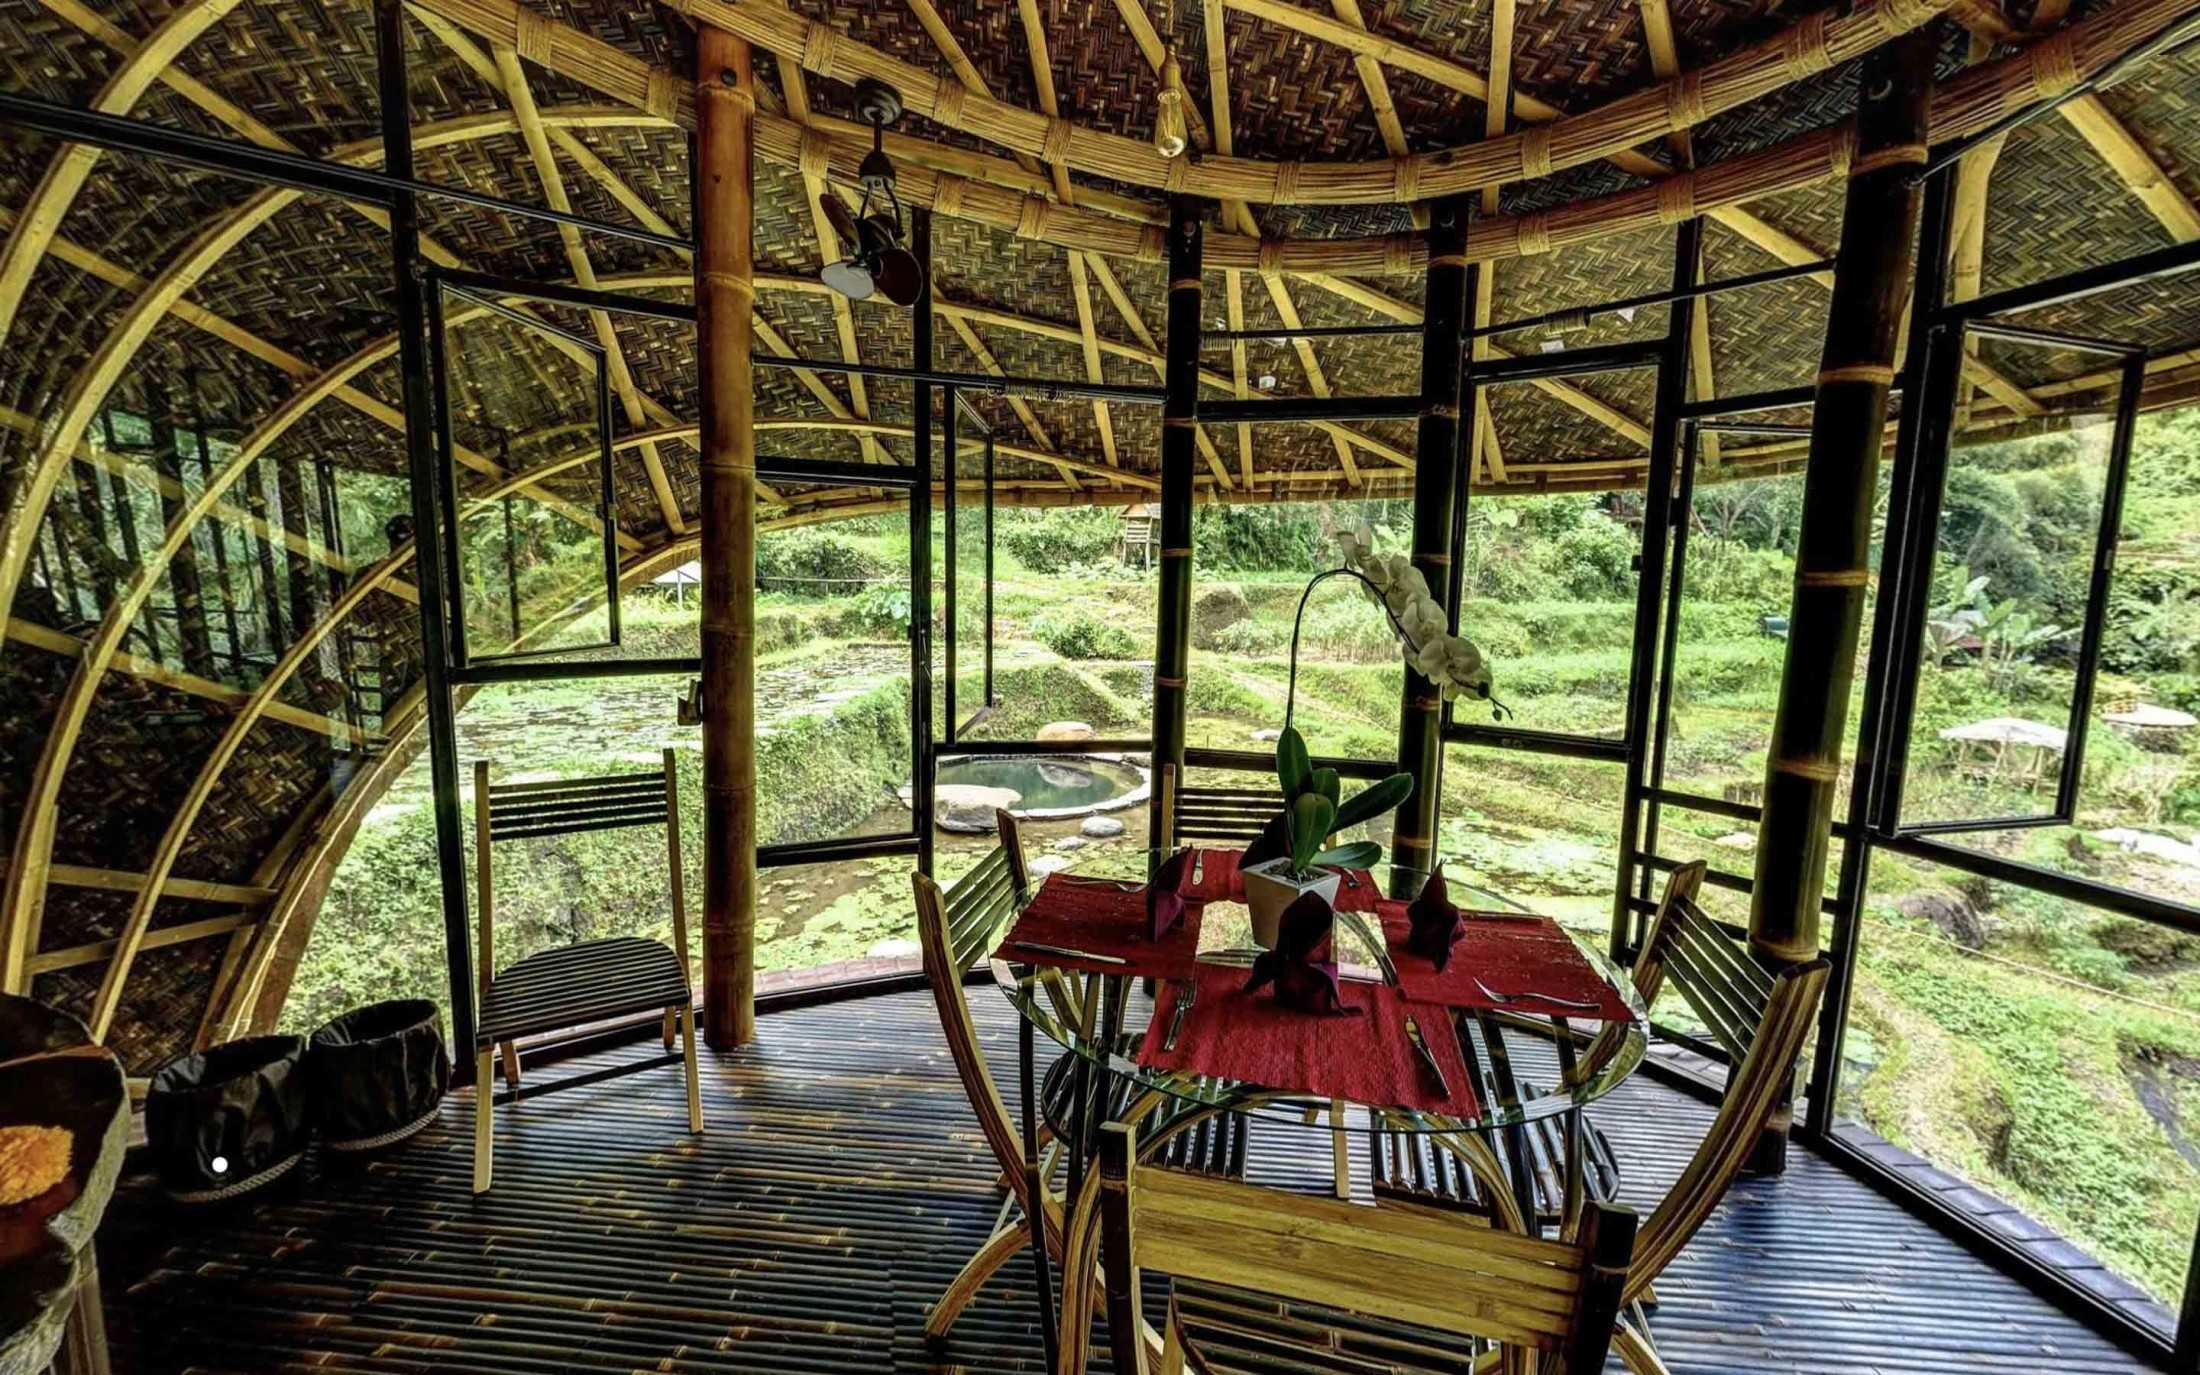 Agung Budi Raharsa | Architecture & Engineering Riverbend Bamboo House - Bali Bali, Indonesia Bali, Indonesia Agung-Budi-Raharsa-Riverbend-House-Bali  88713